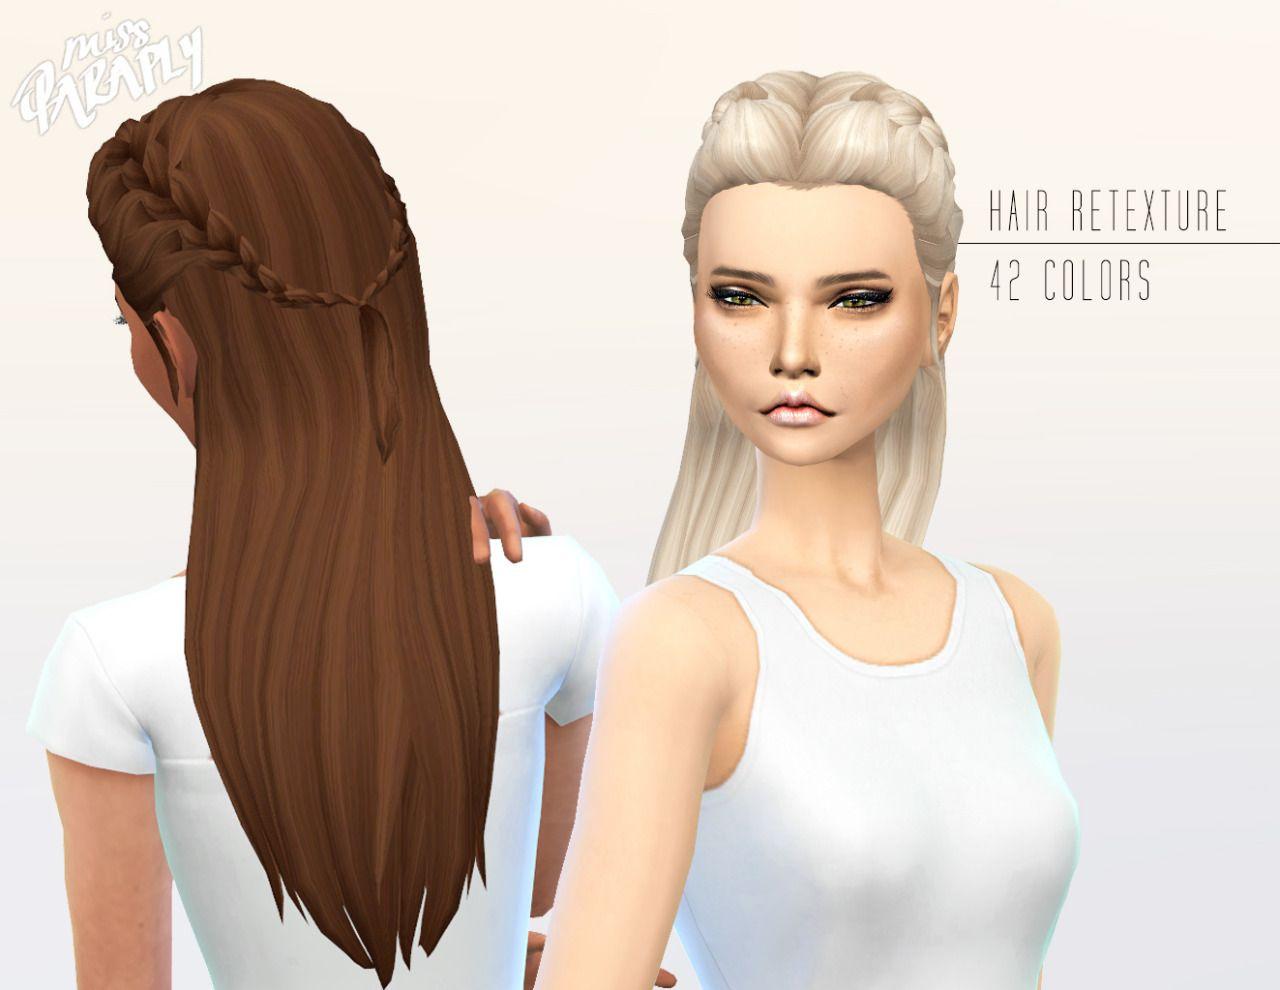 The sims 4 hairstyles cc - Miss Paraply Kiara 24 Absolution Hairstyle Sims 4 Hairs Http The Simssims Ccsims